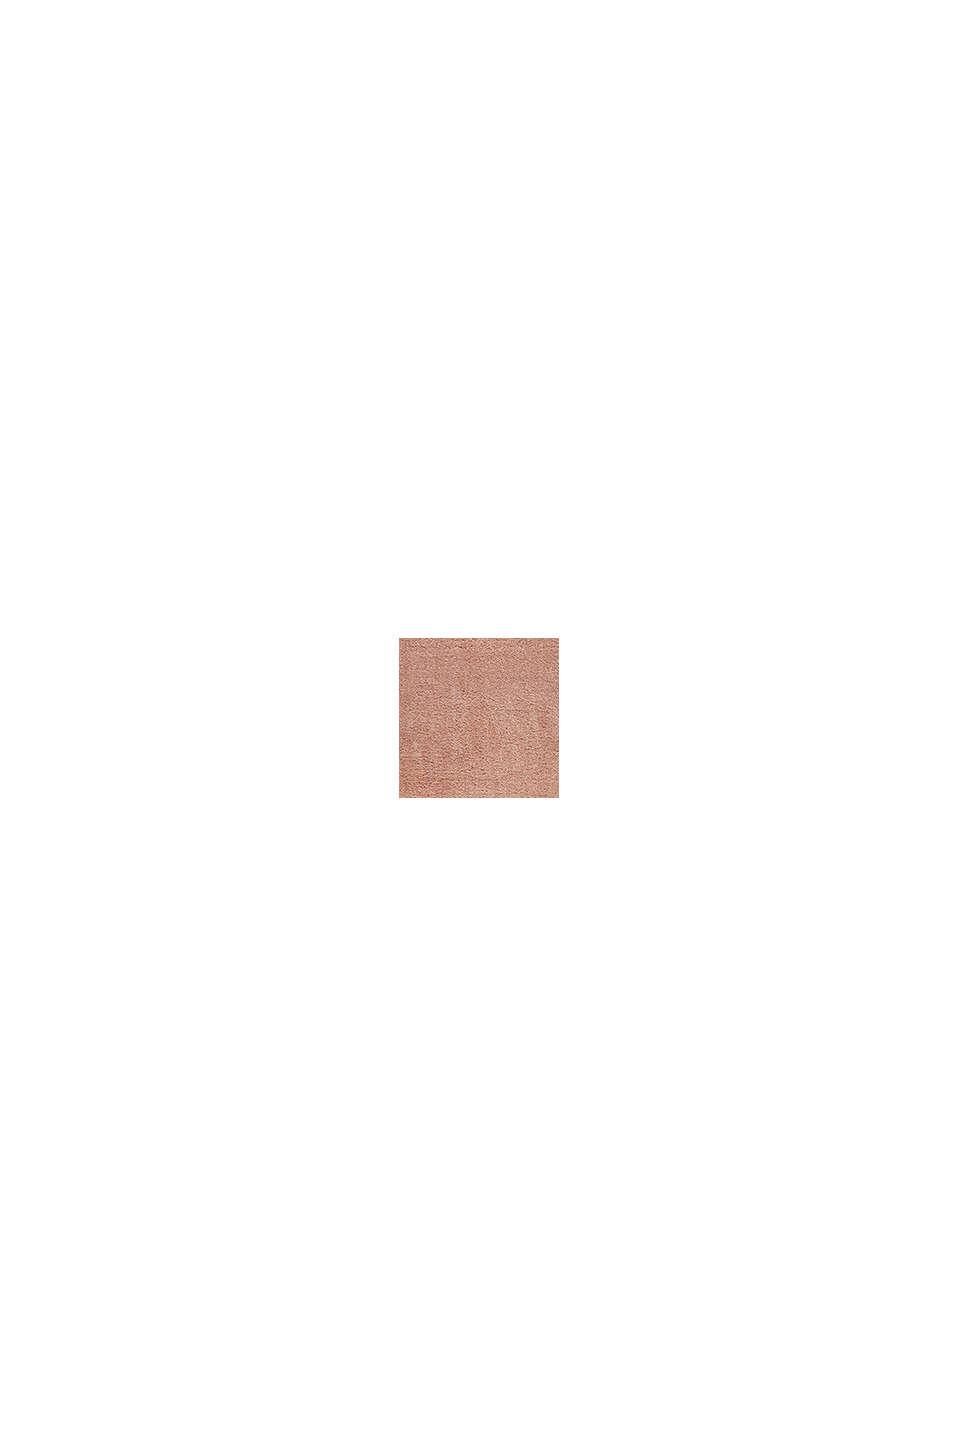 Gewebter Hochflor-Teppich, meliert, ROSE, swatch